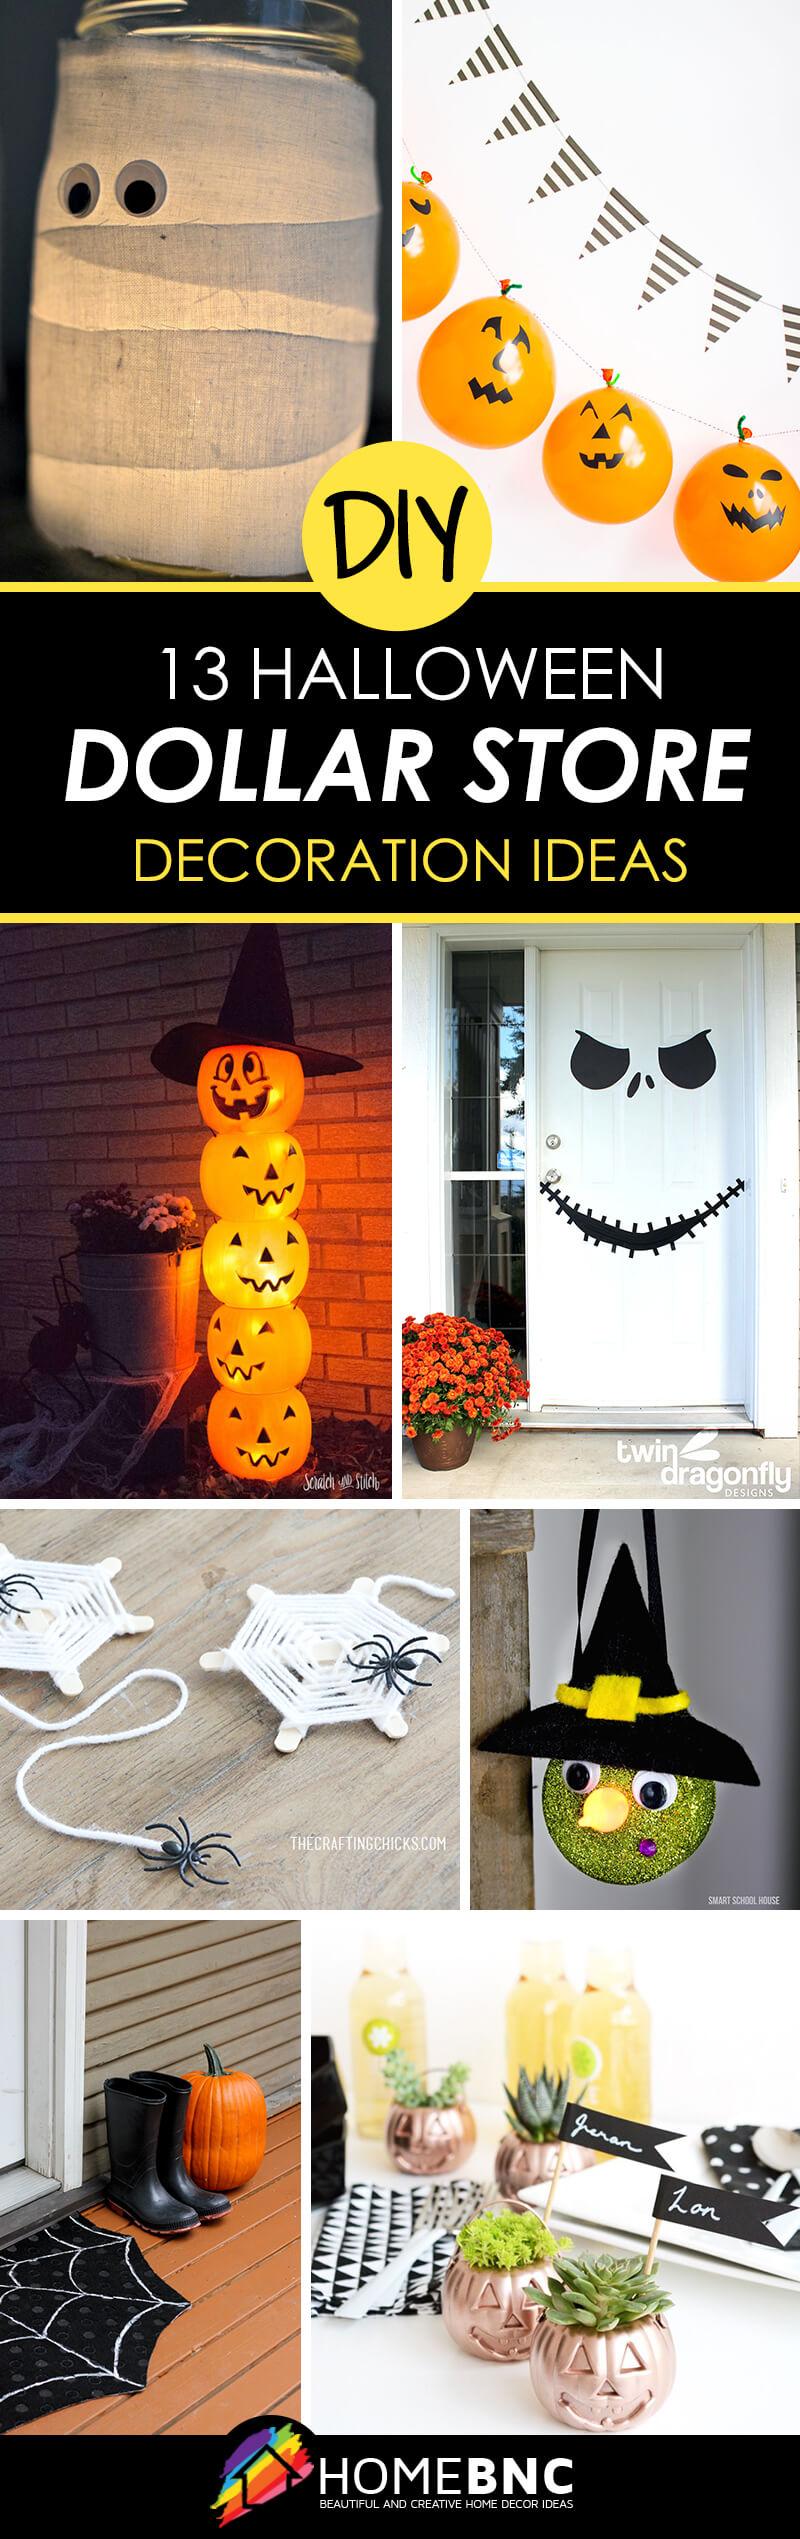 DIY Dollar Store Halloween Decoration Ideas